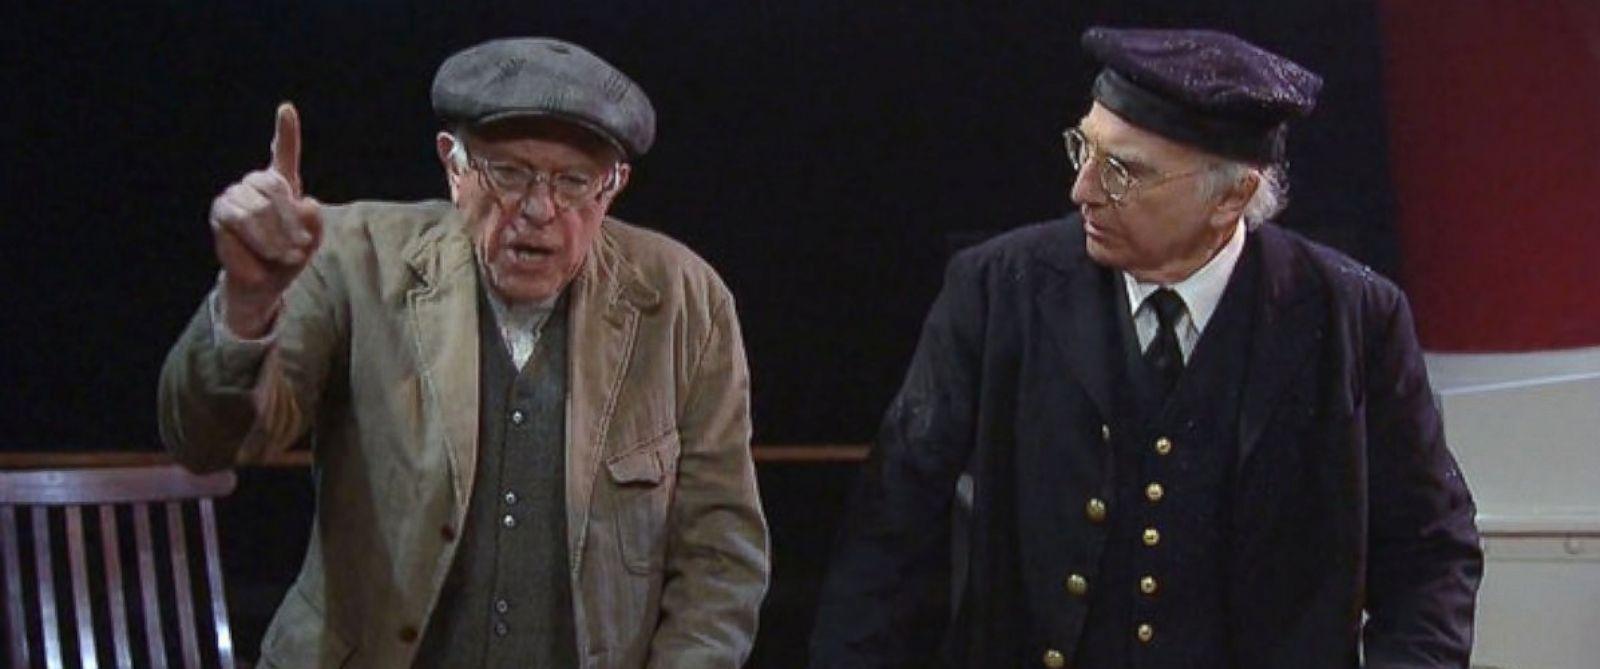 Bernie Sanders and Larry David (courtesy of abcnews.com)